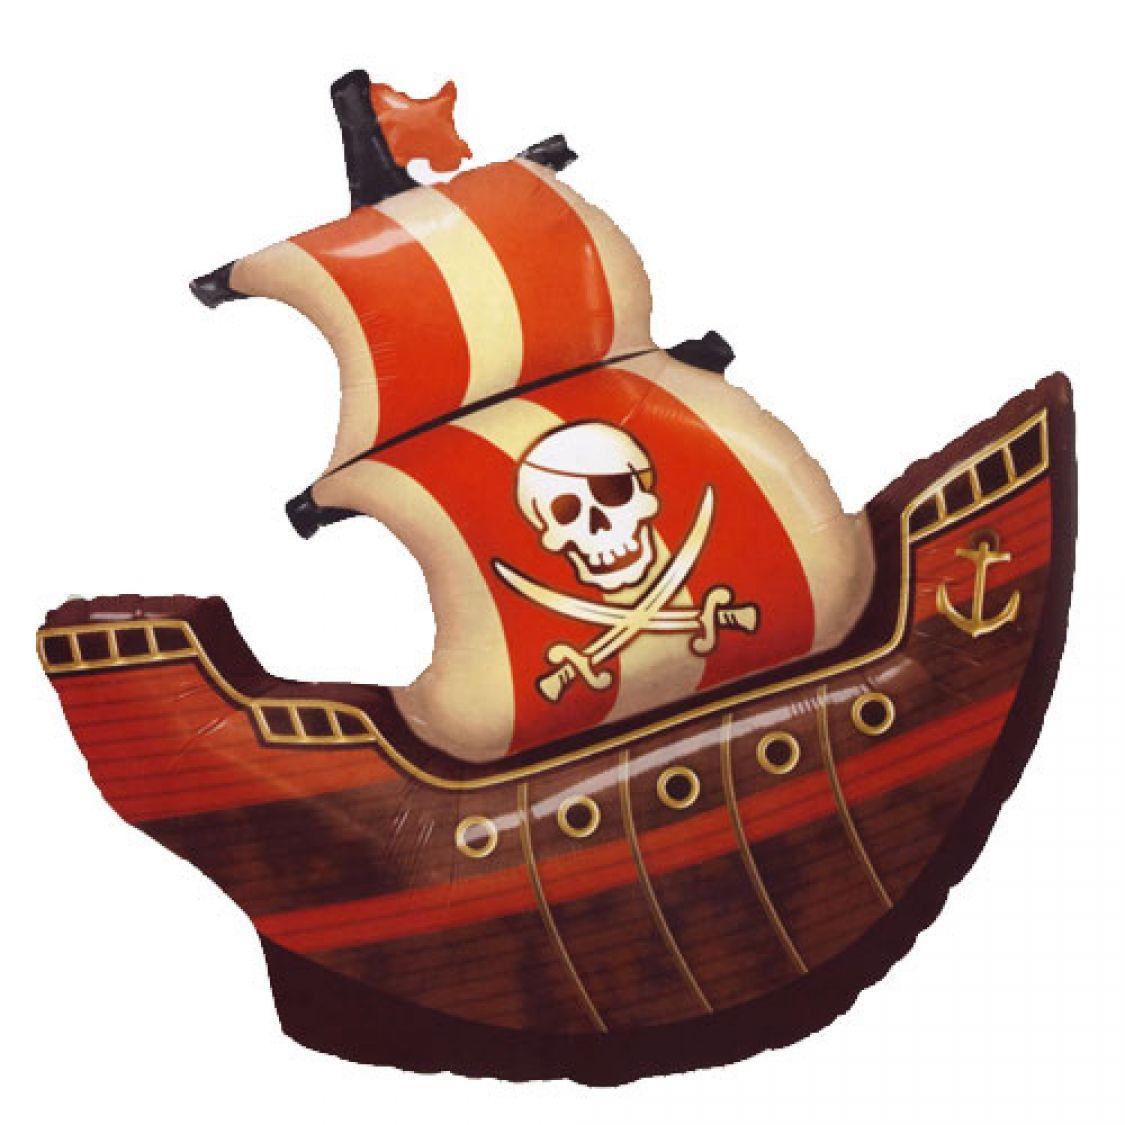 Ballon bateau pirate - Image bateau pirate ...